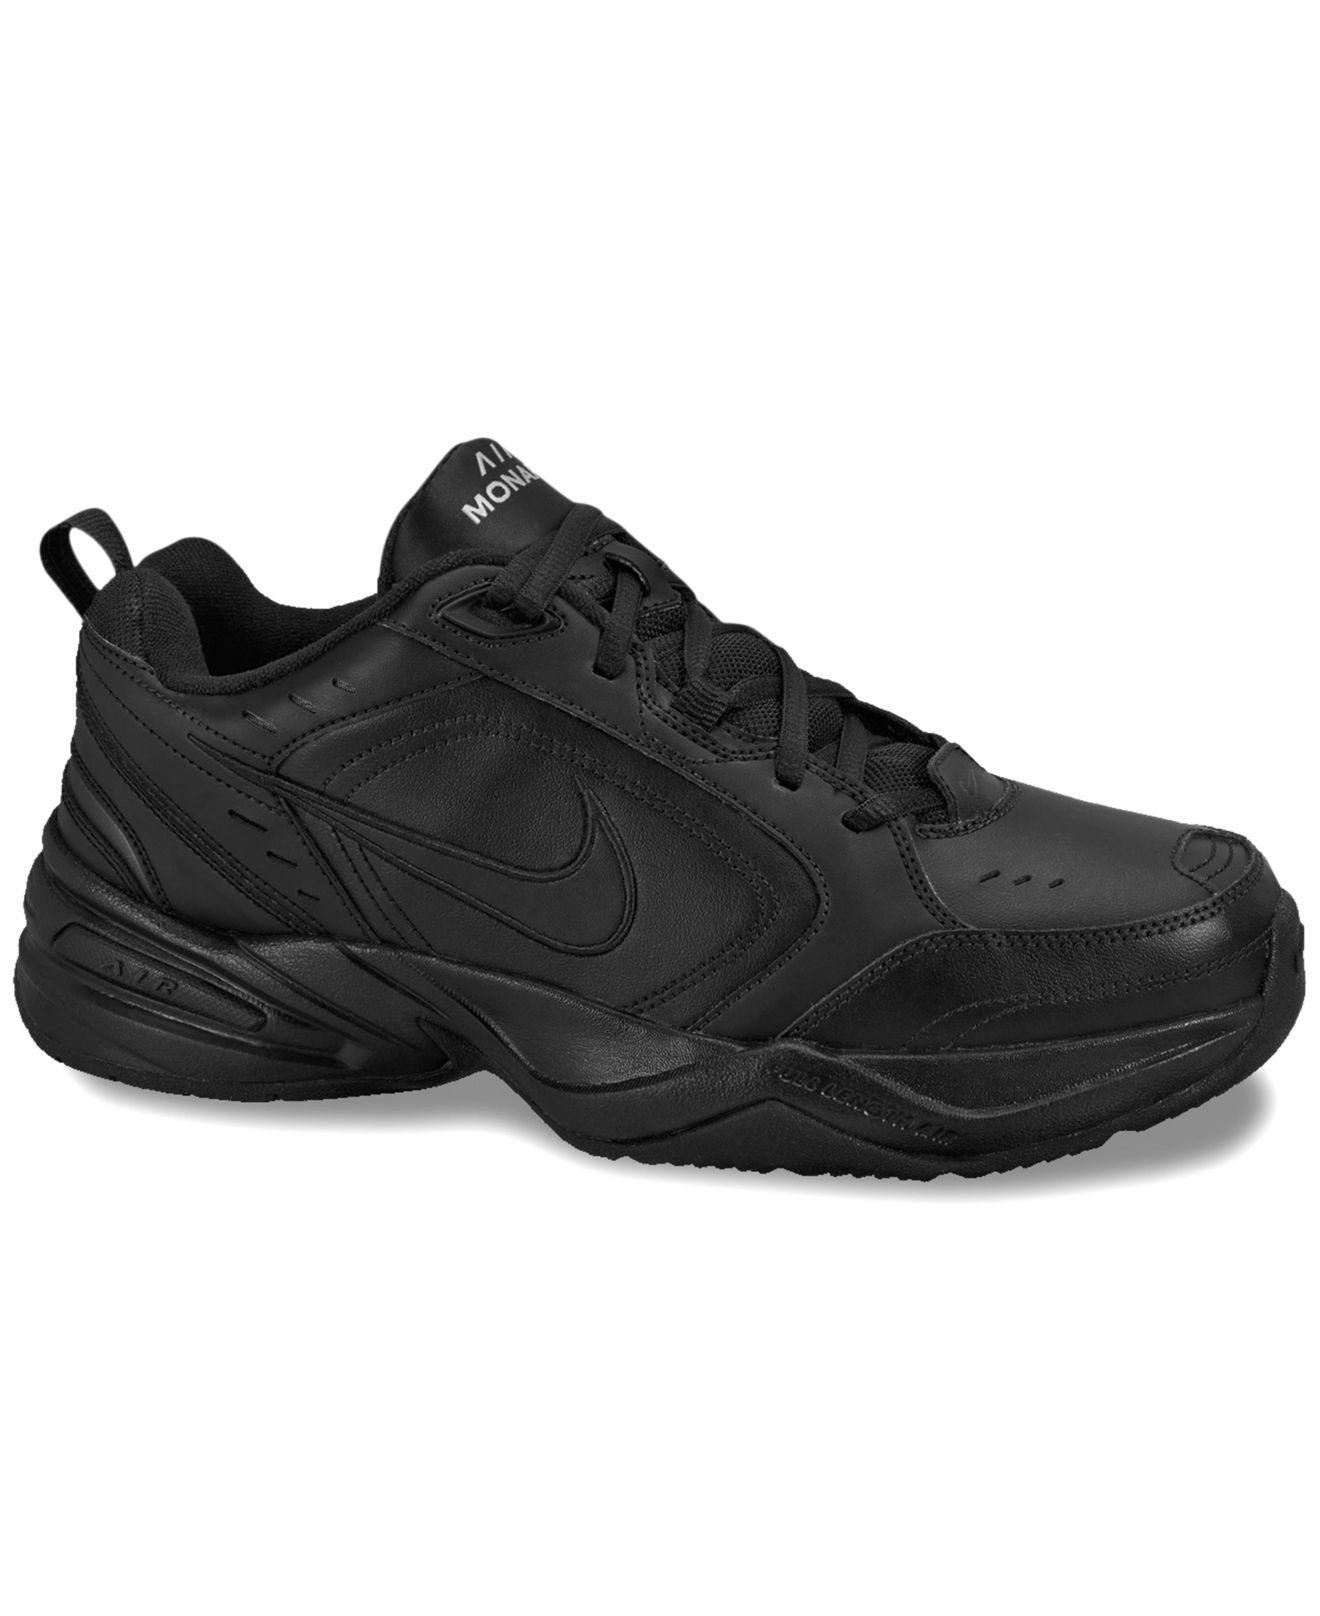 monarch sneakers